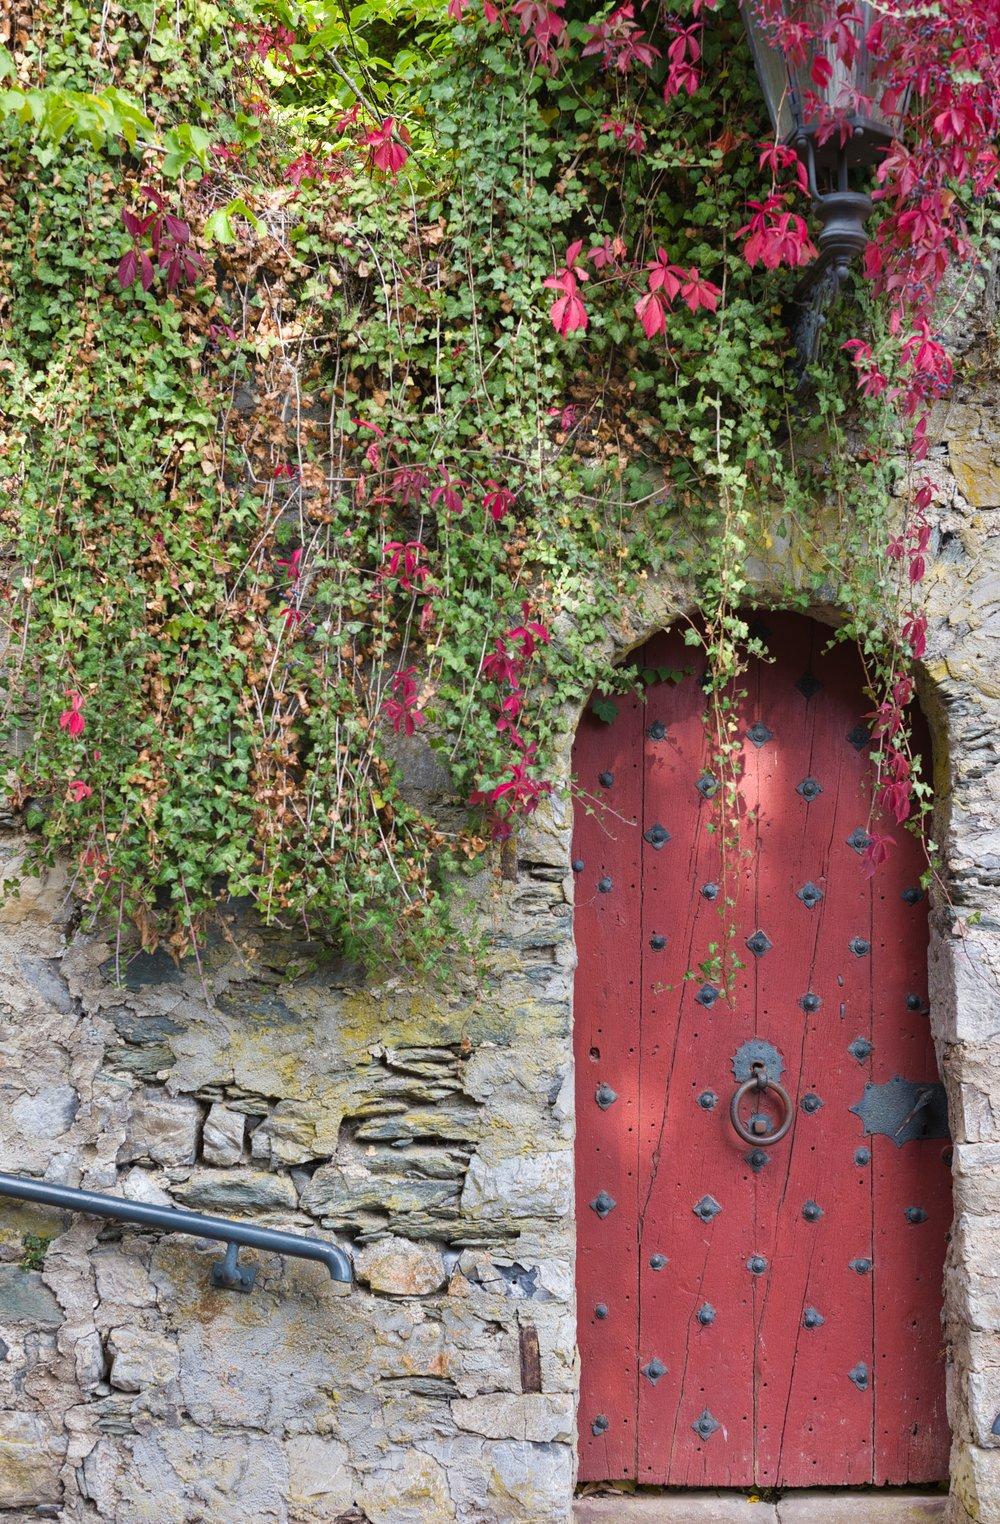 Die Tür. Braunfelds, Germany Leica SL 50mm f/2.0 APO Summicron © Keith R. Sbiral, 2018